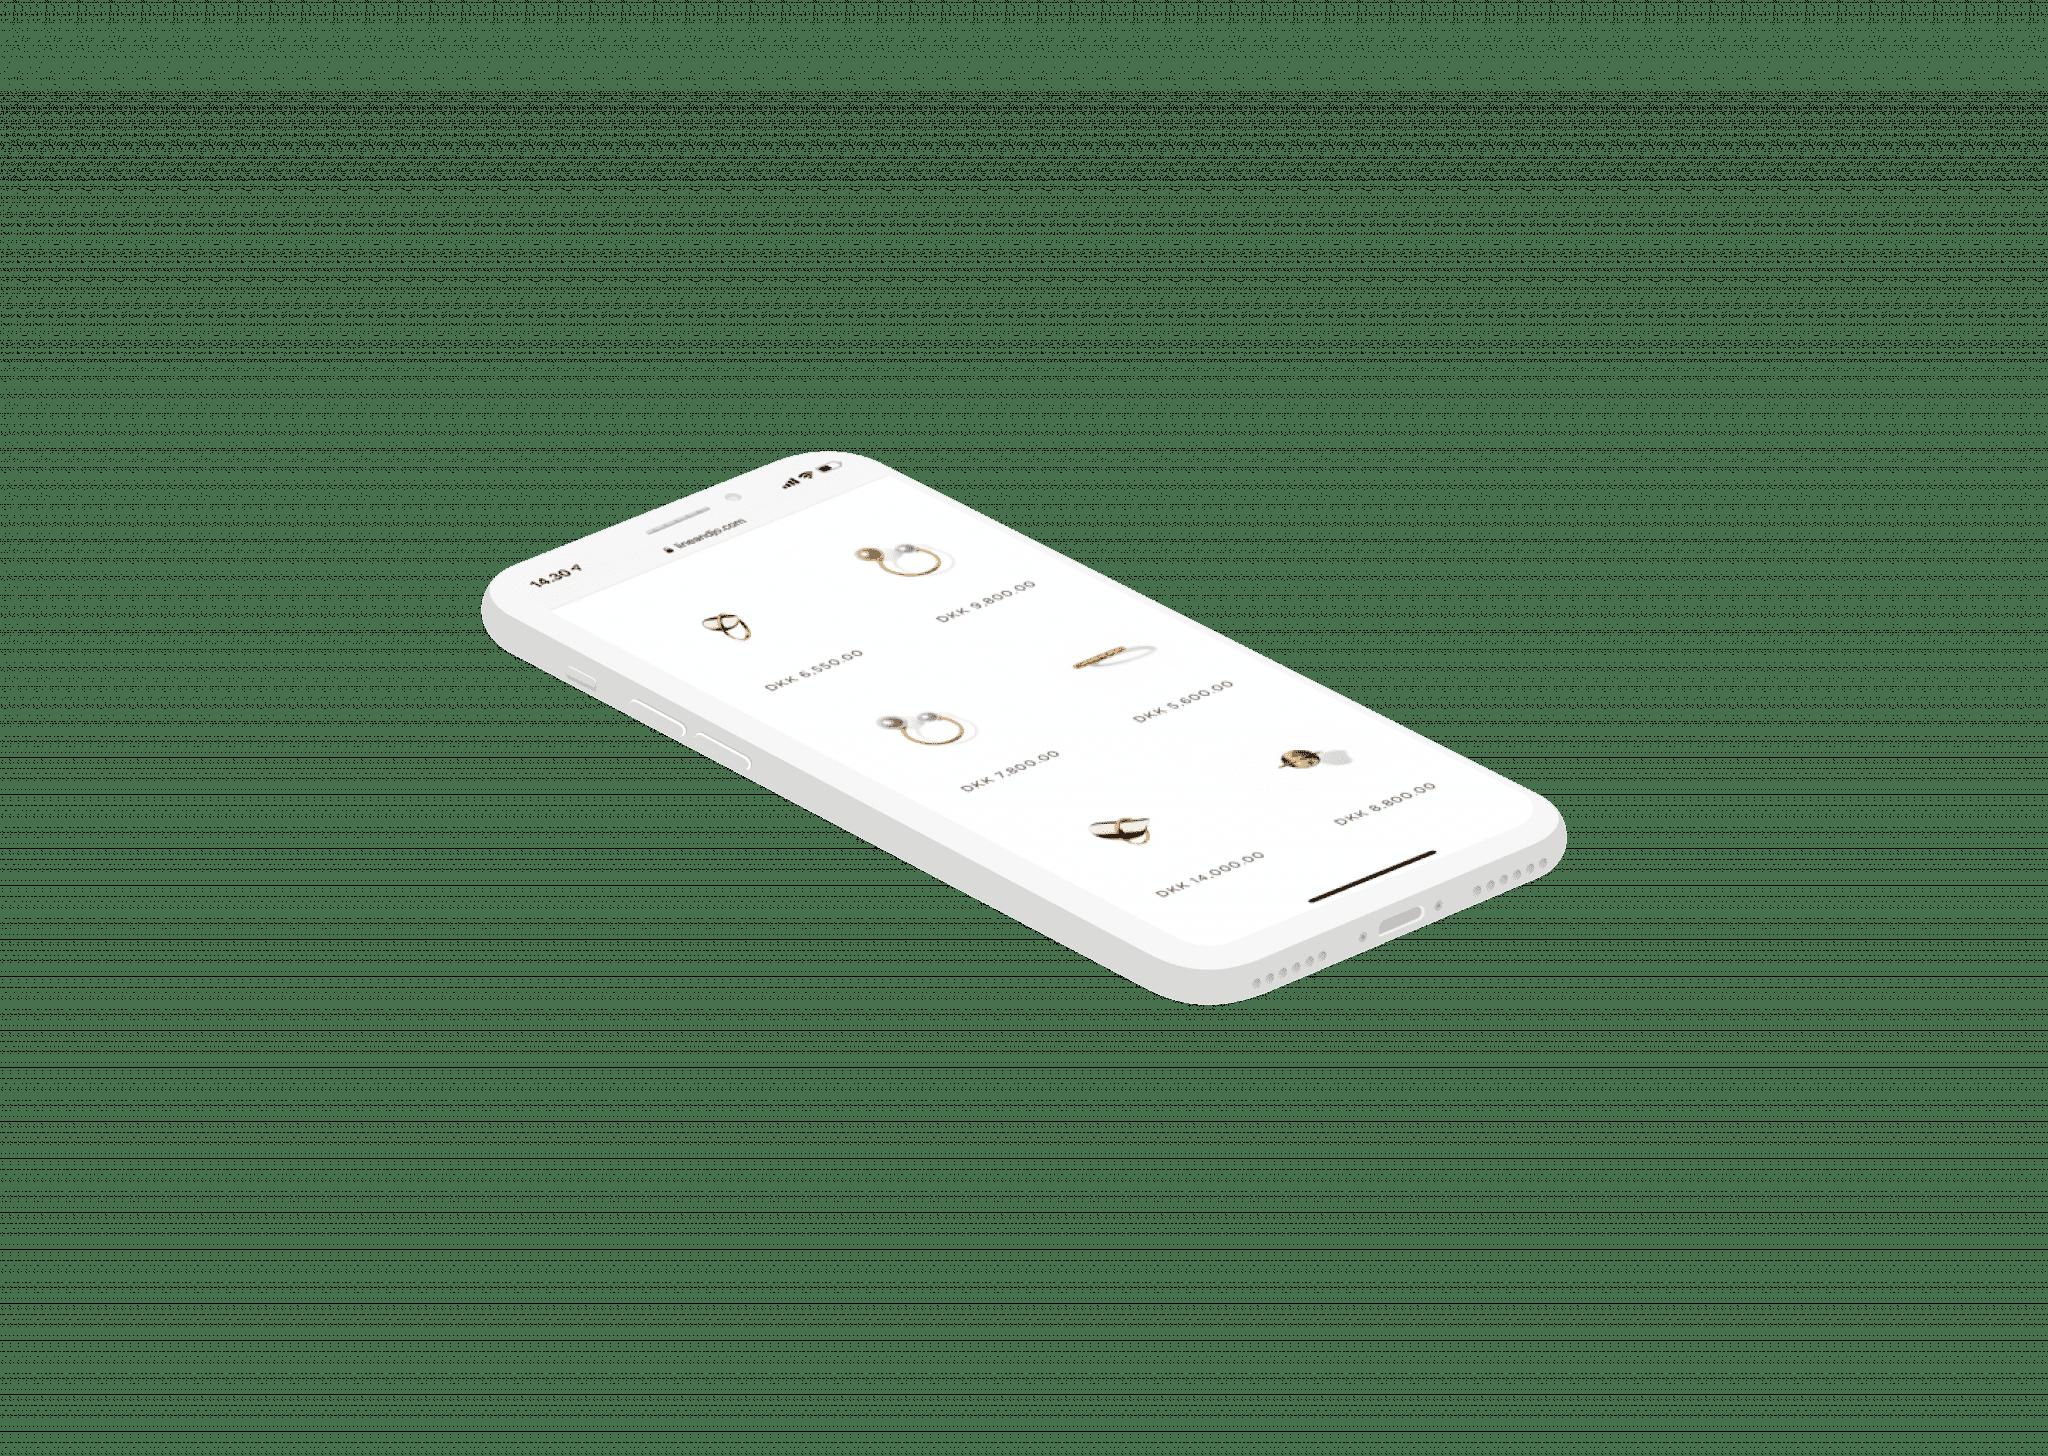 Line_Jo_5 - Iphone X@2x